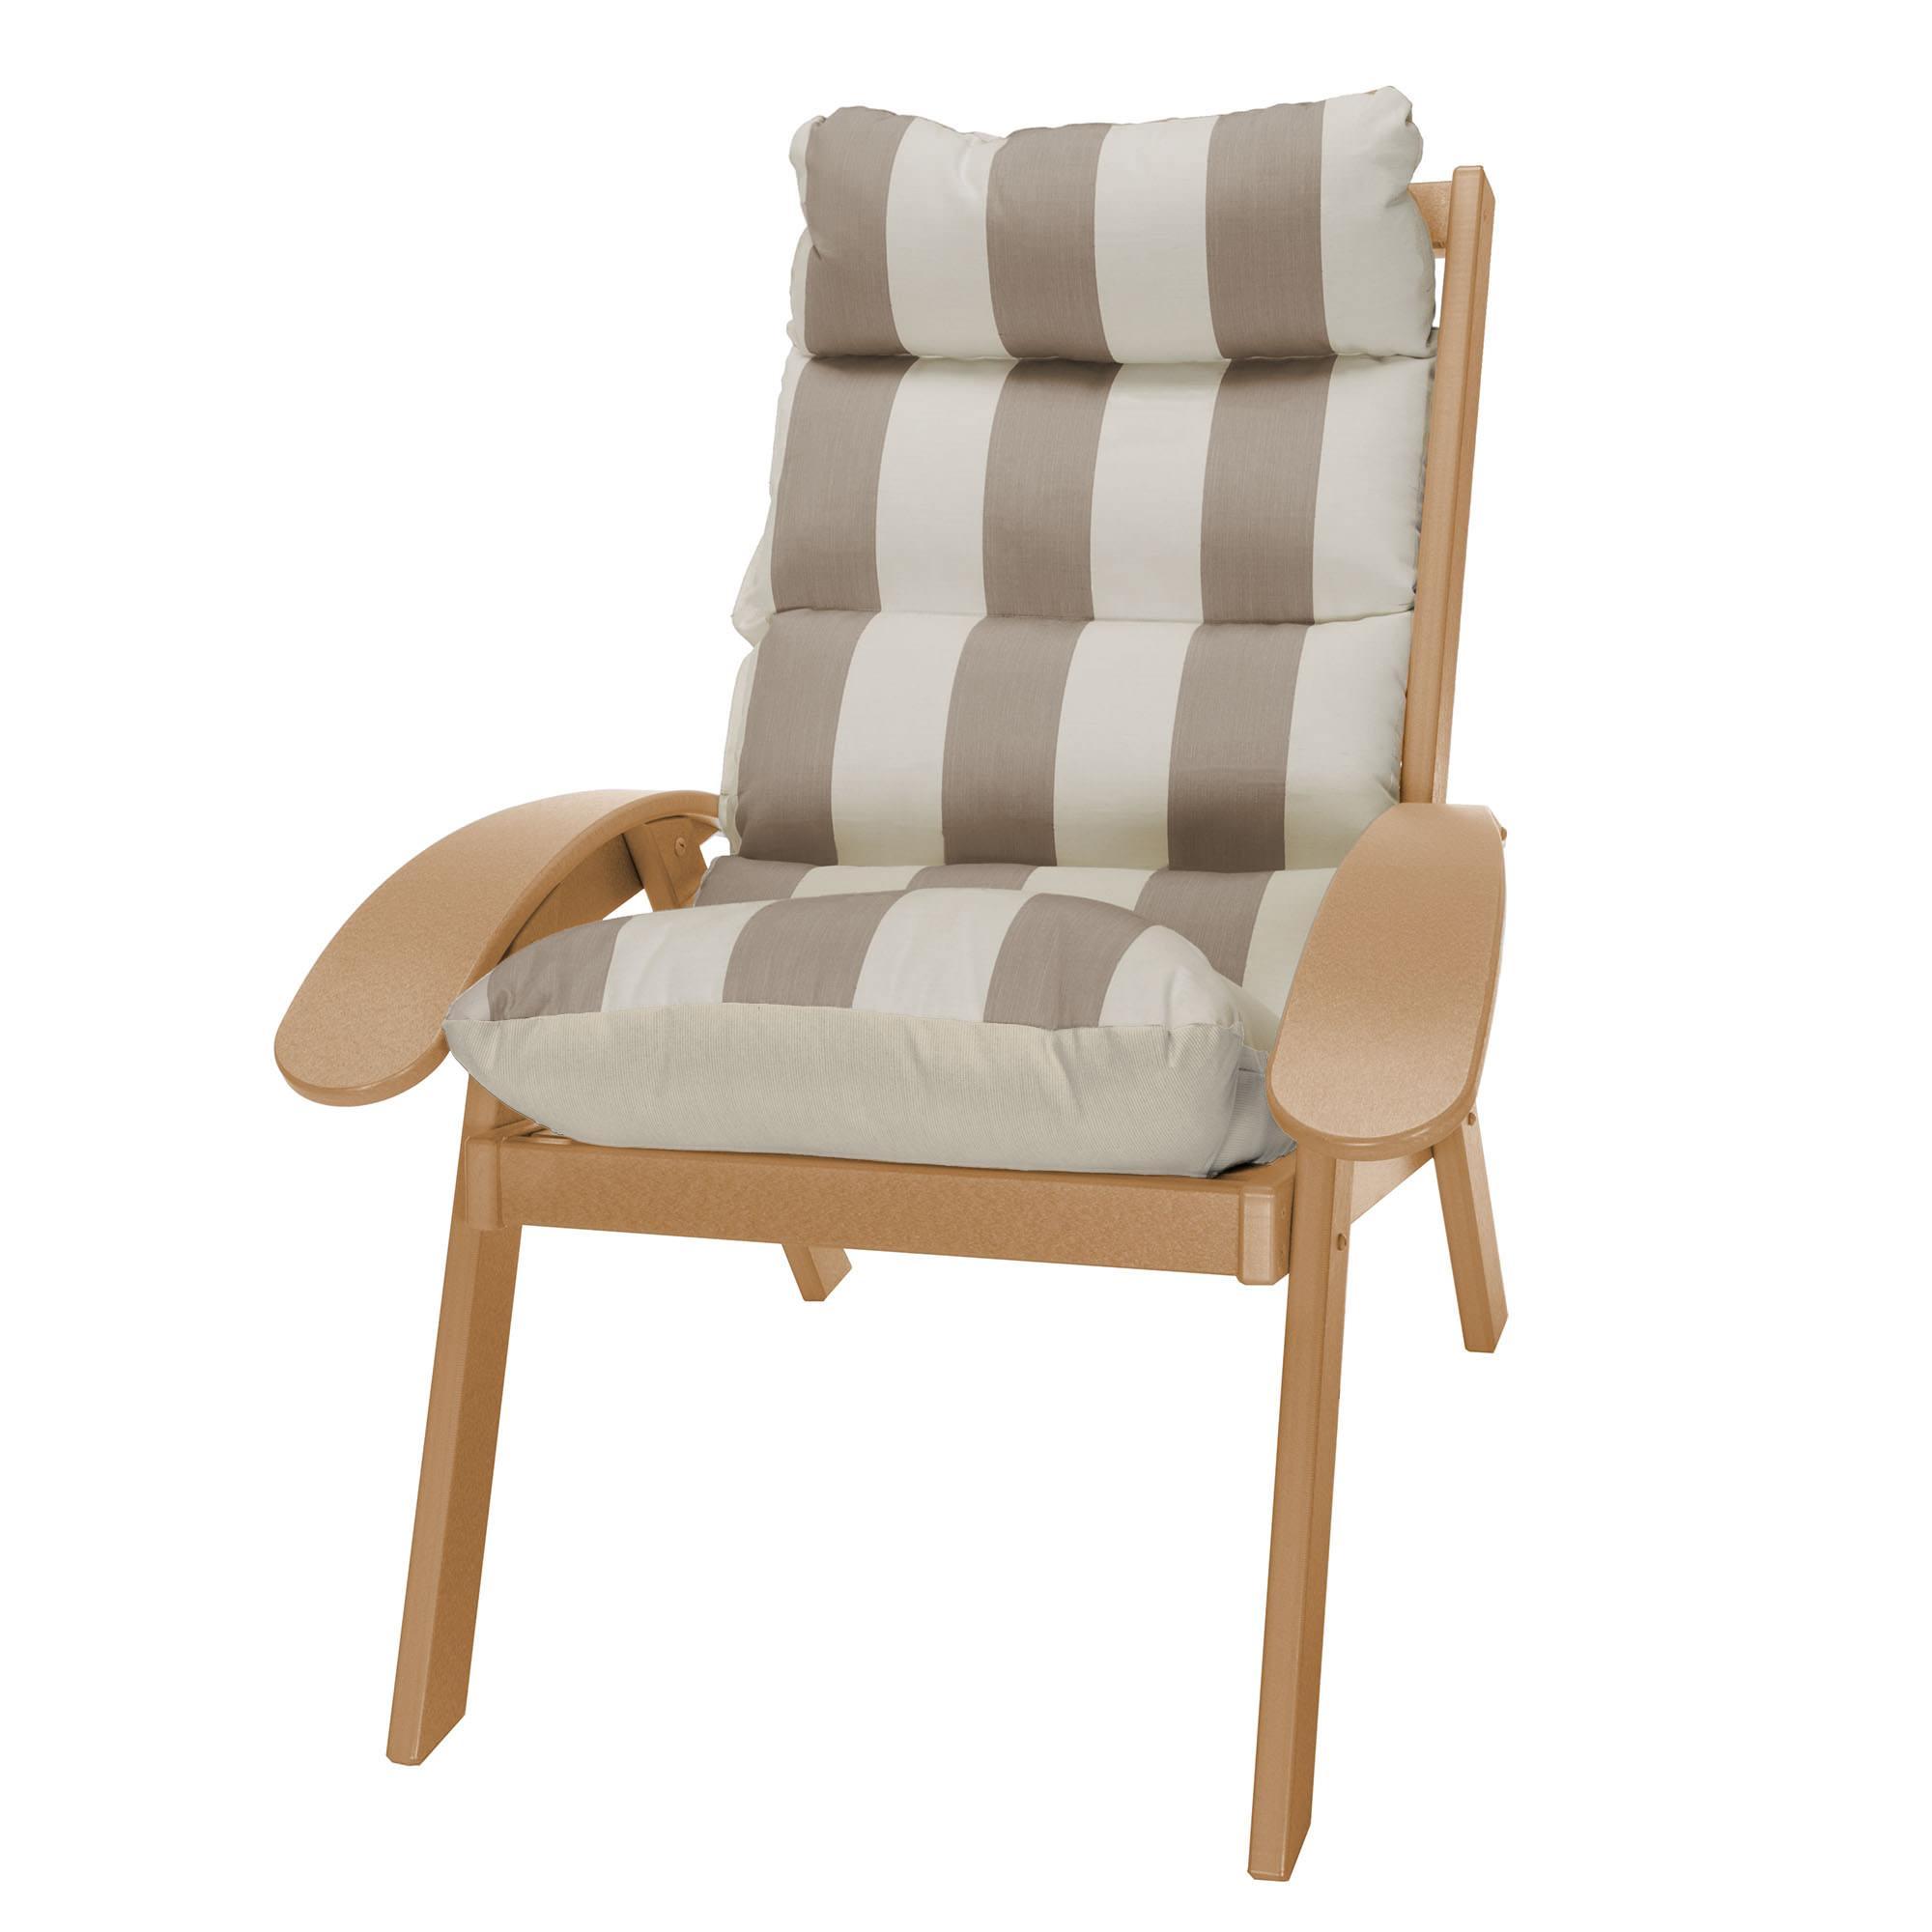 Coastal Cedar Cushion Chair On Sale Shop Patio Furniture